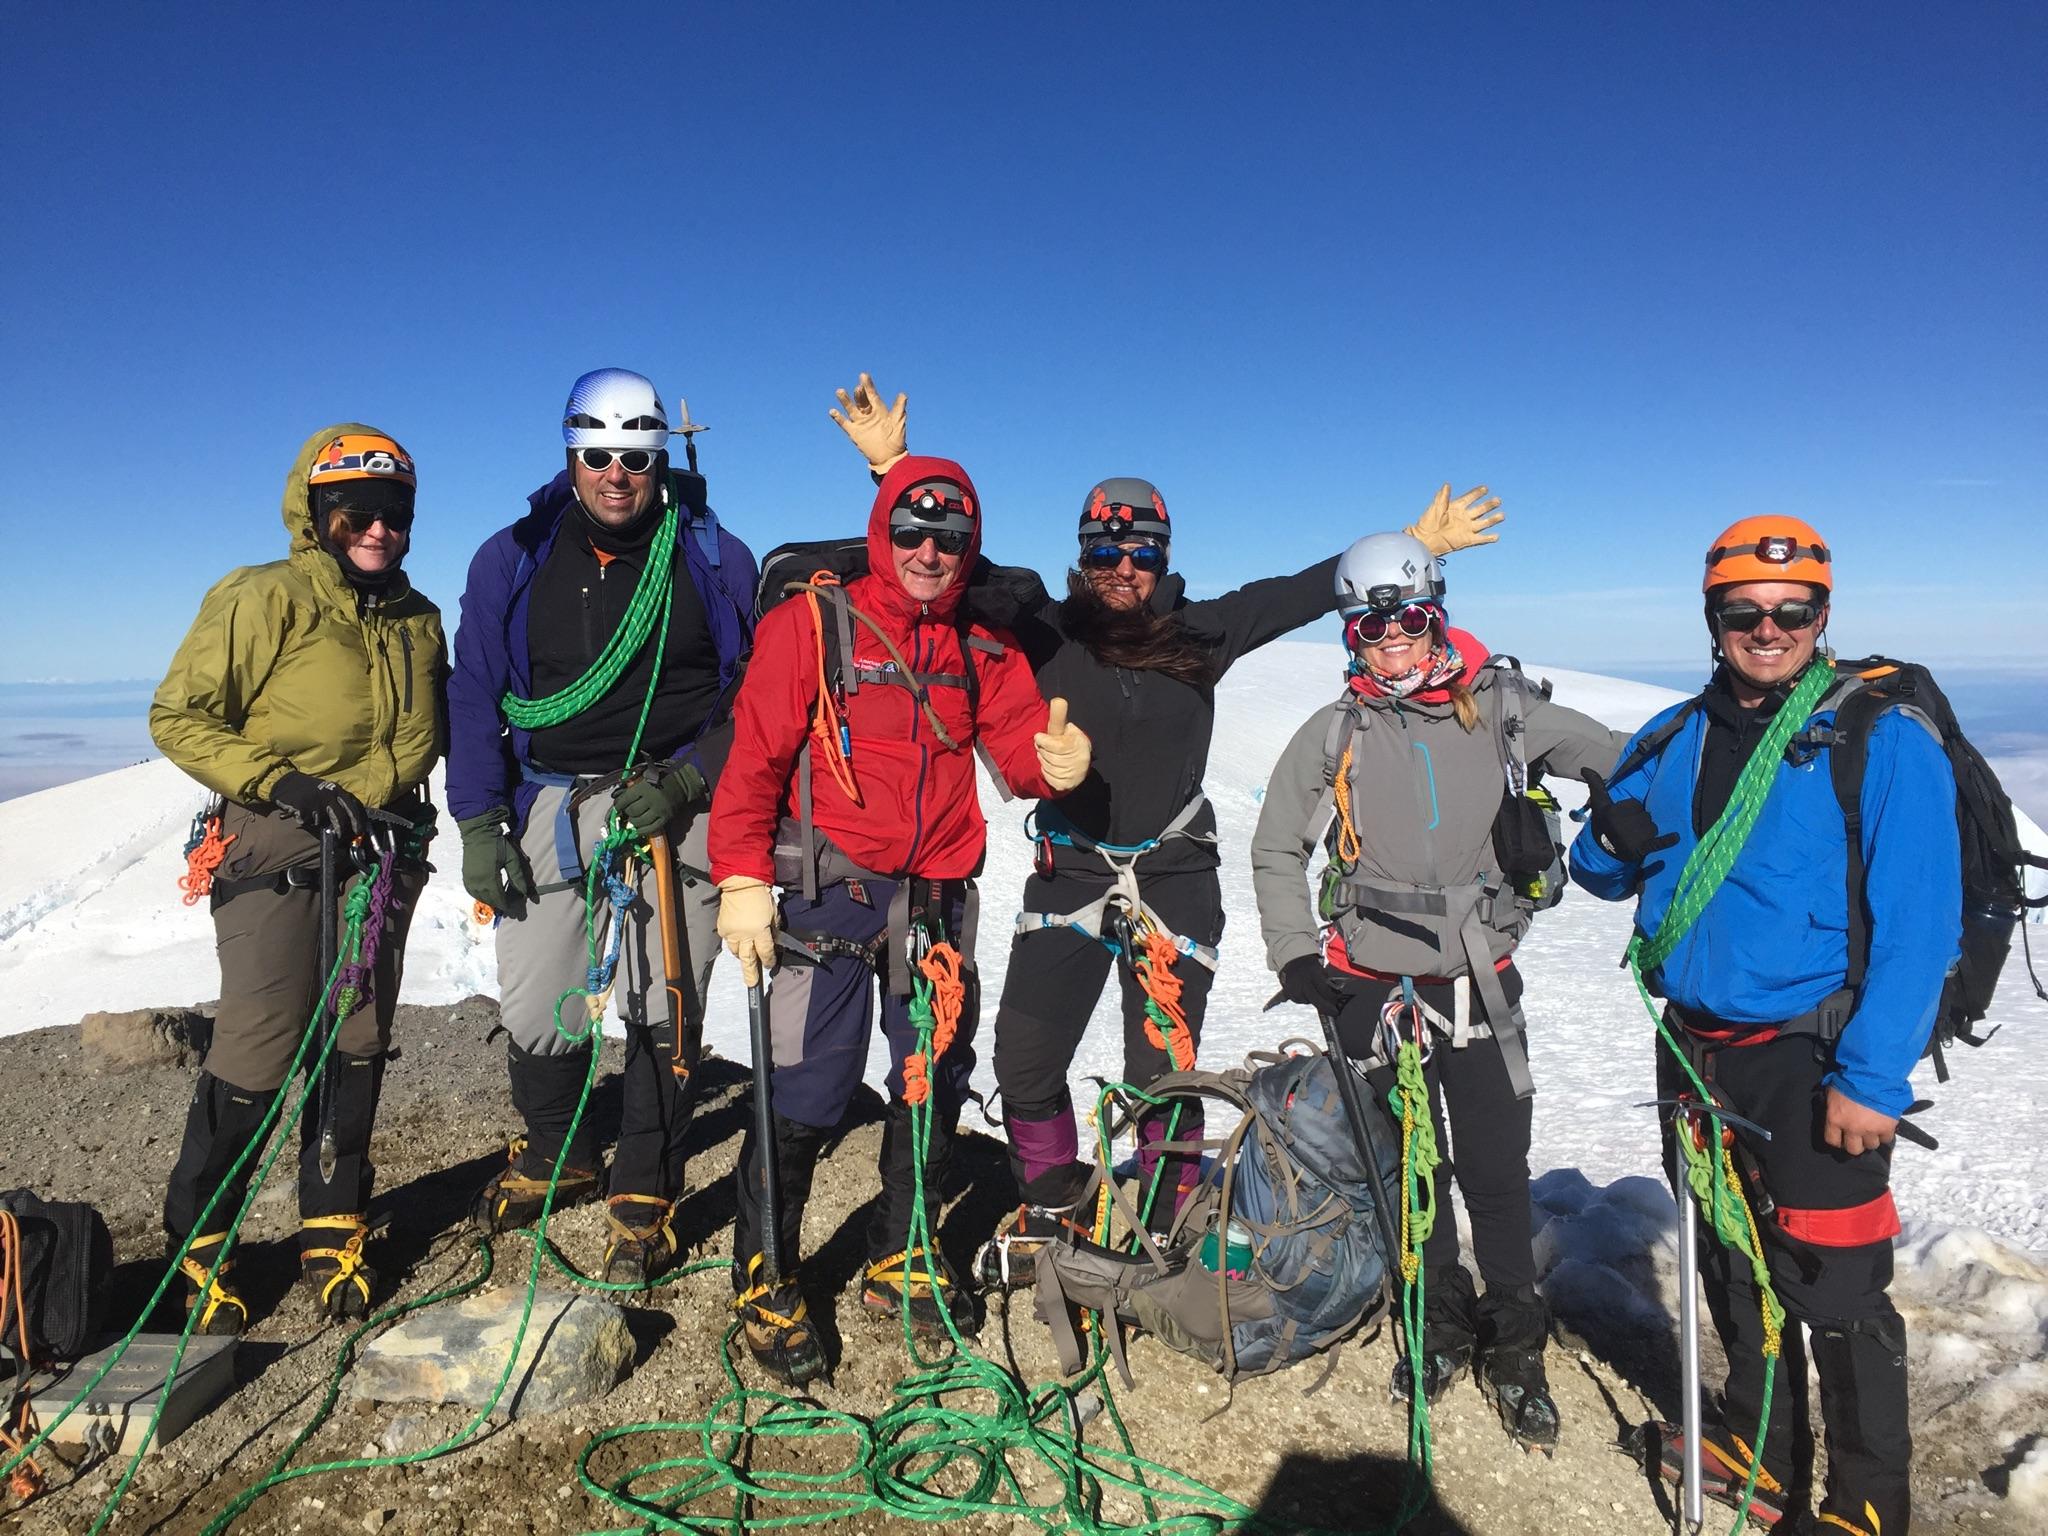 Baker Summit . From the left: Justin Smith (LRC member), Erin Olsen, Krystle Edwards (LRC Director), Pete Edwards, Paul Rosser (AAI guide), and Jeanne Rosser.